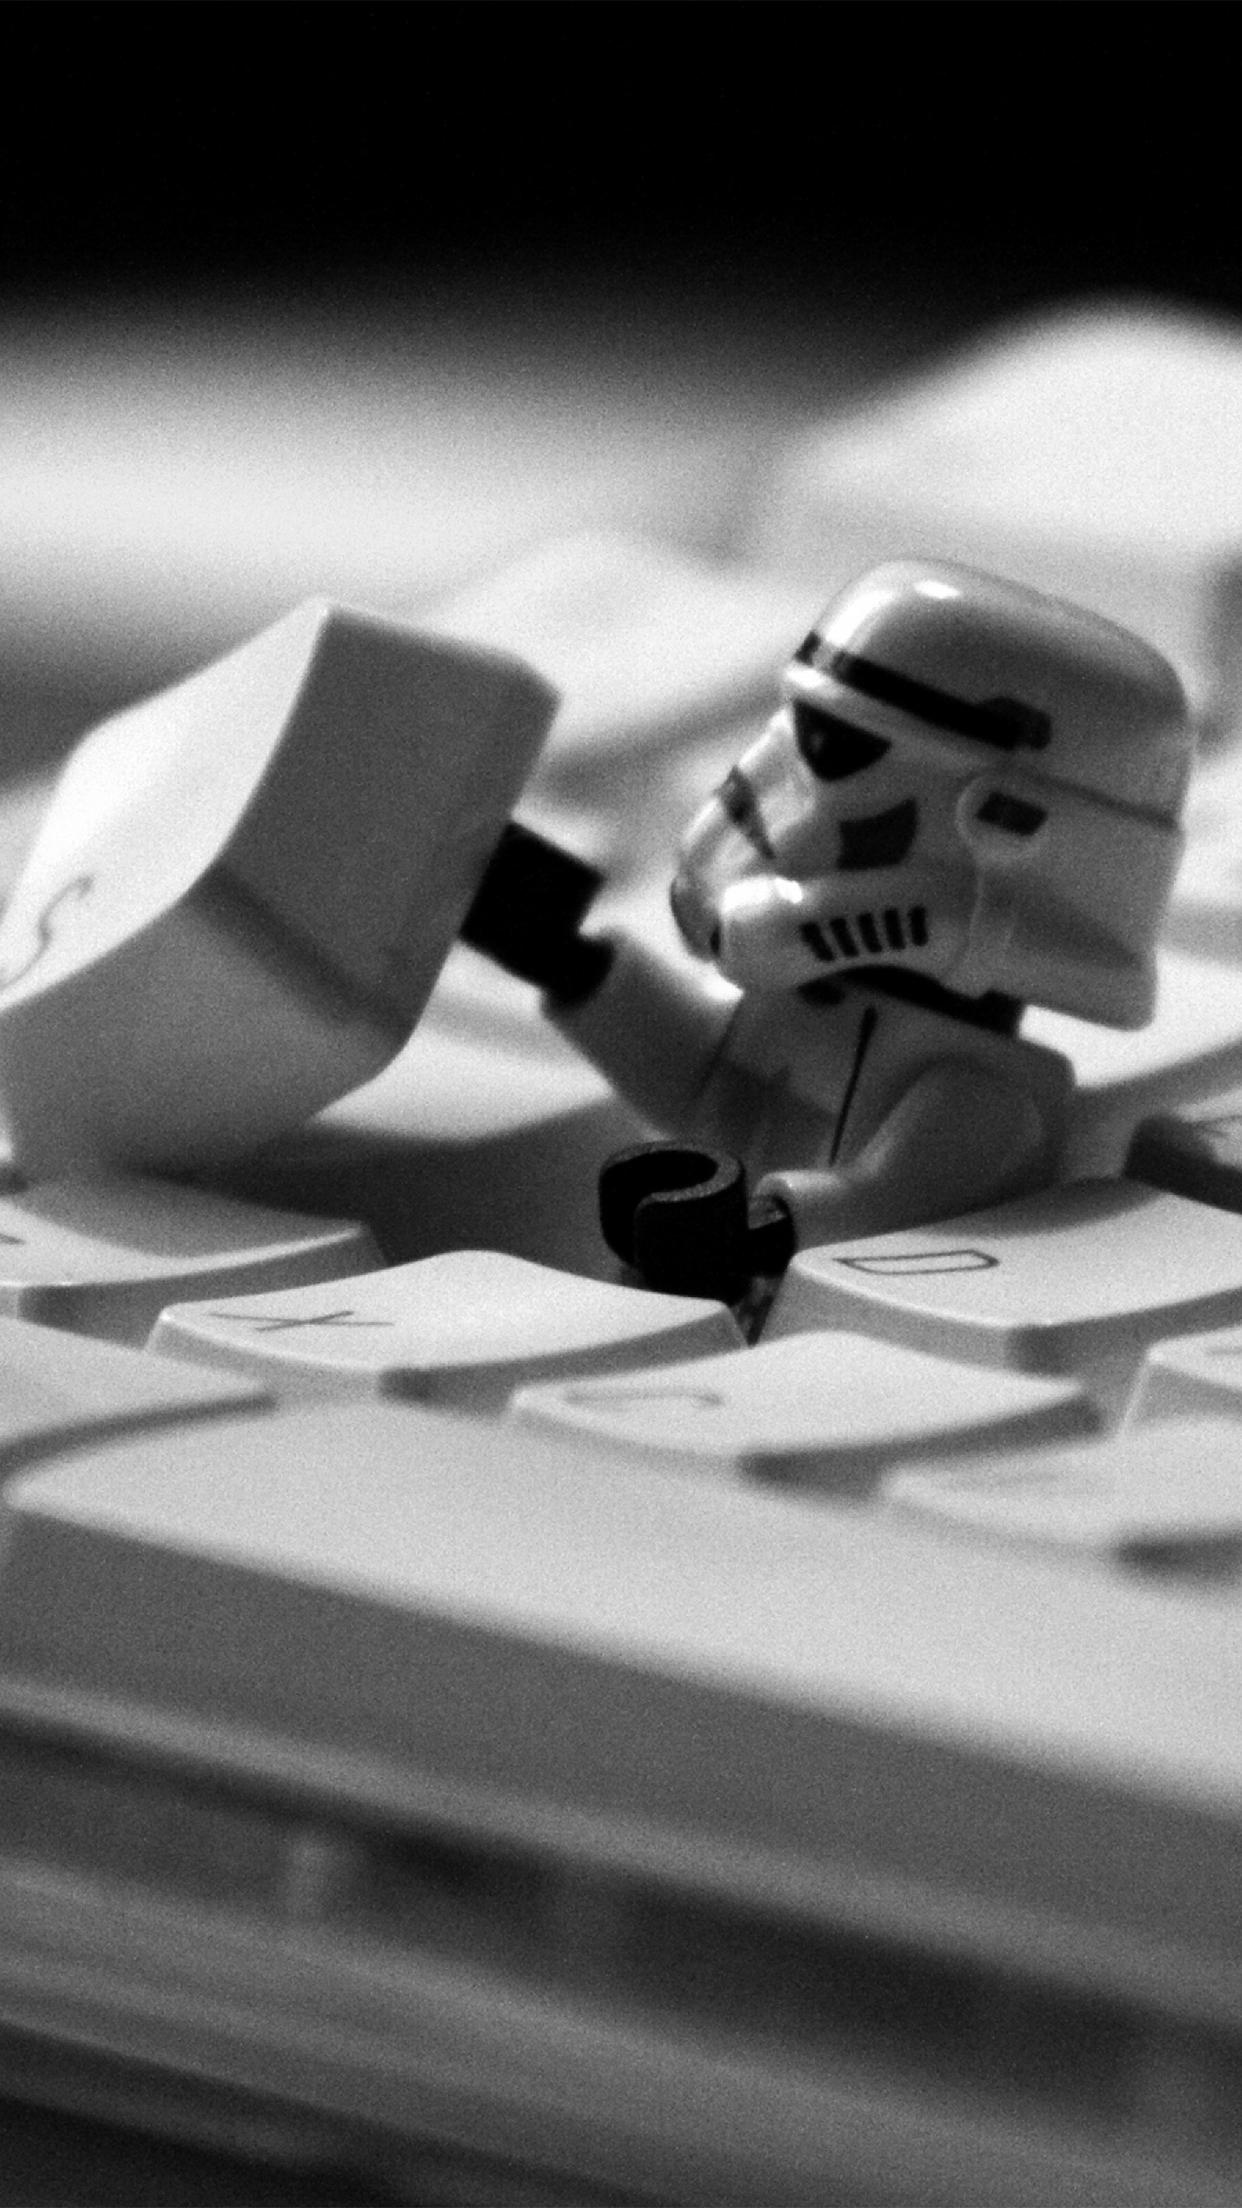 Lego Star Wars Keyboard 3wallpapers Parallax Iphone Funny Star Wars Iphone 1242x2208 Download Hd Wallpaper Wallpapertip